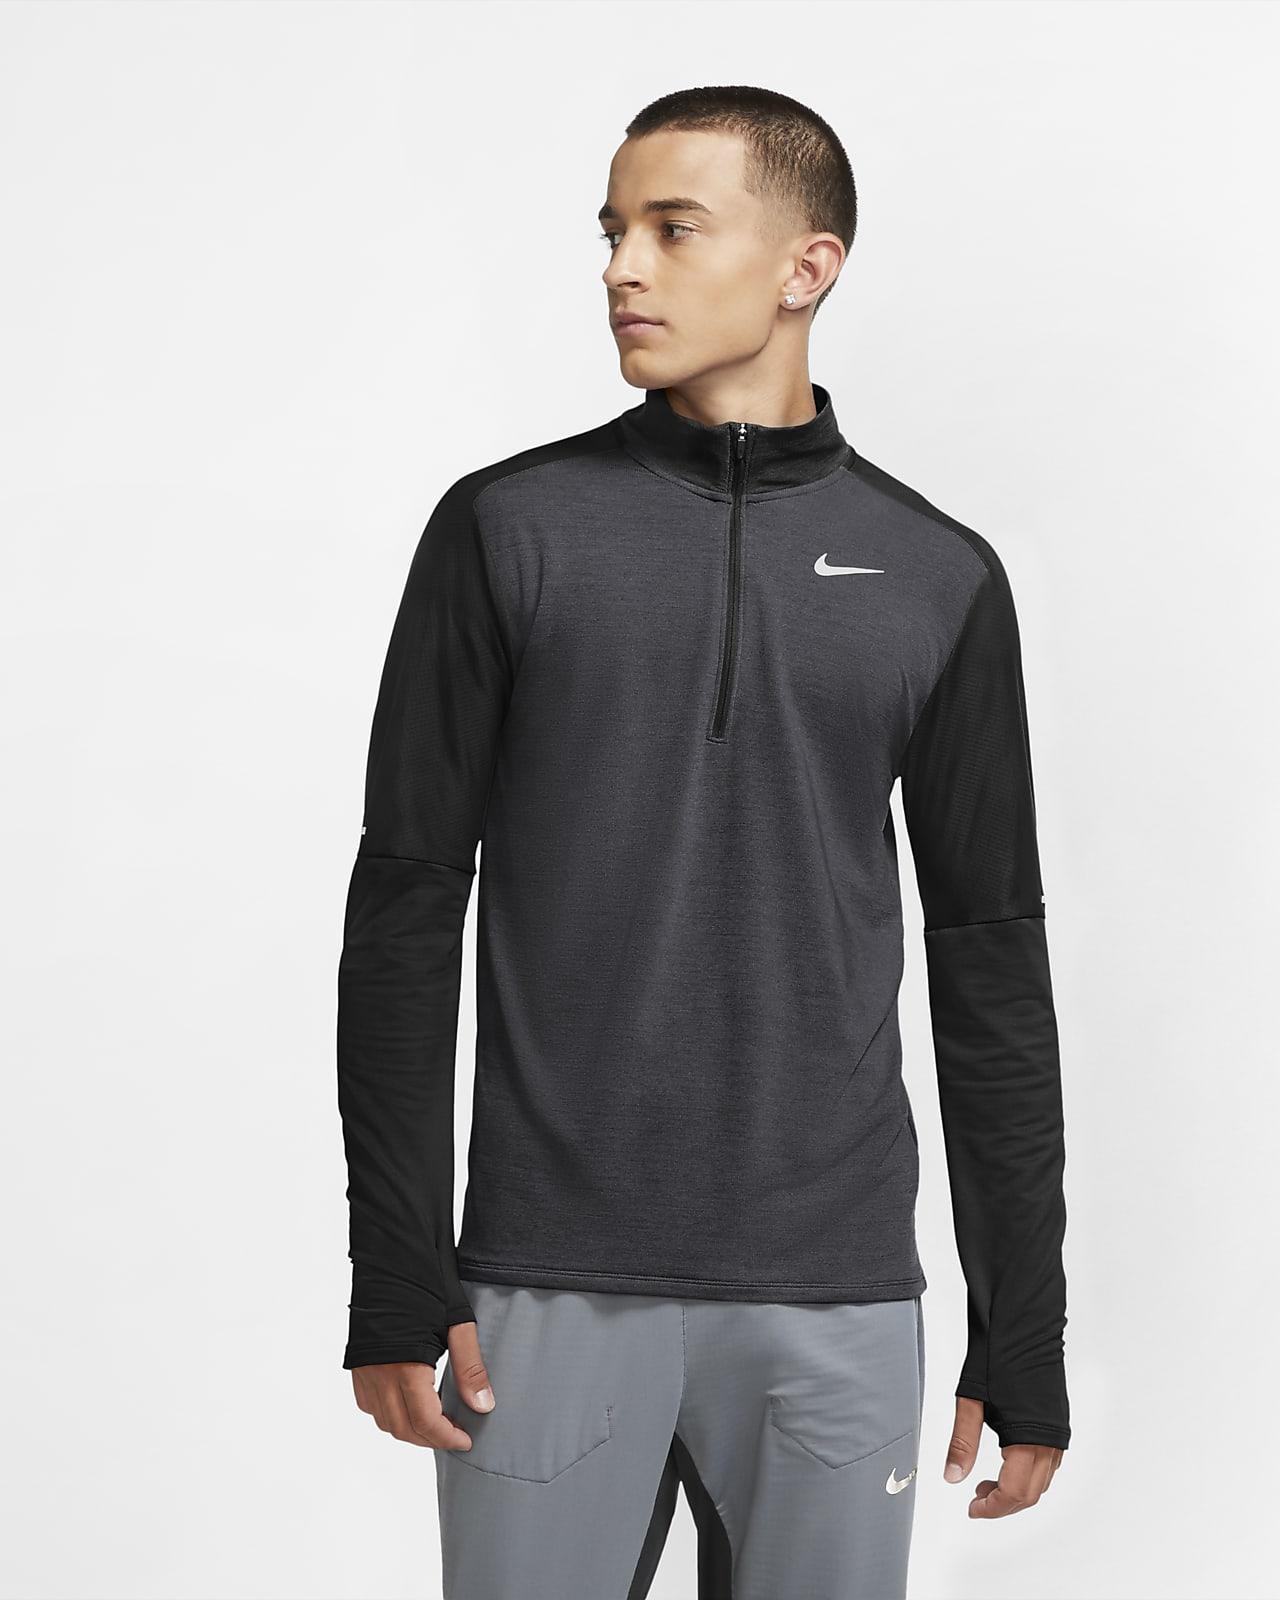 Camiseta de running de medio cierre para hombre Nike Dri-FIT